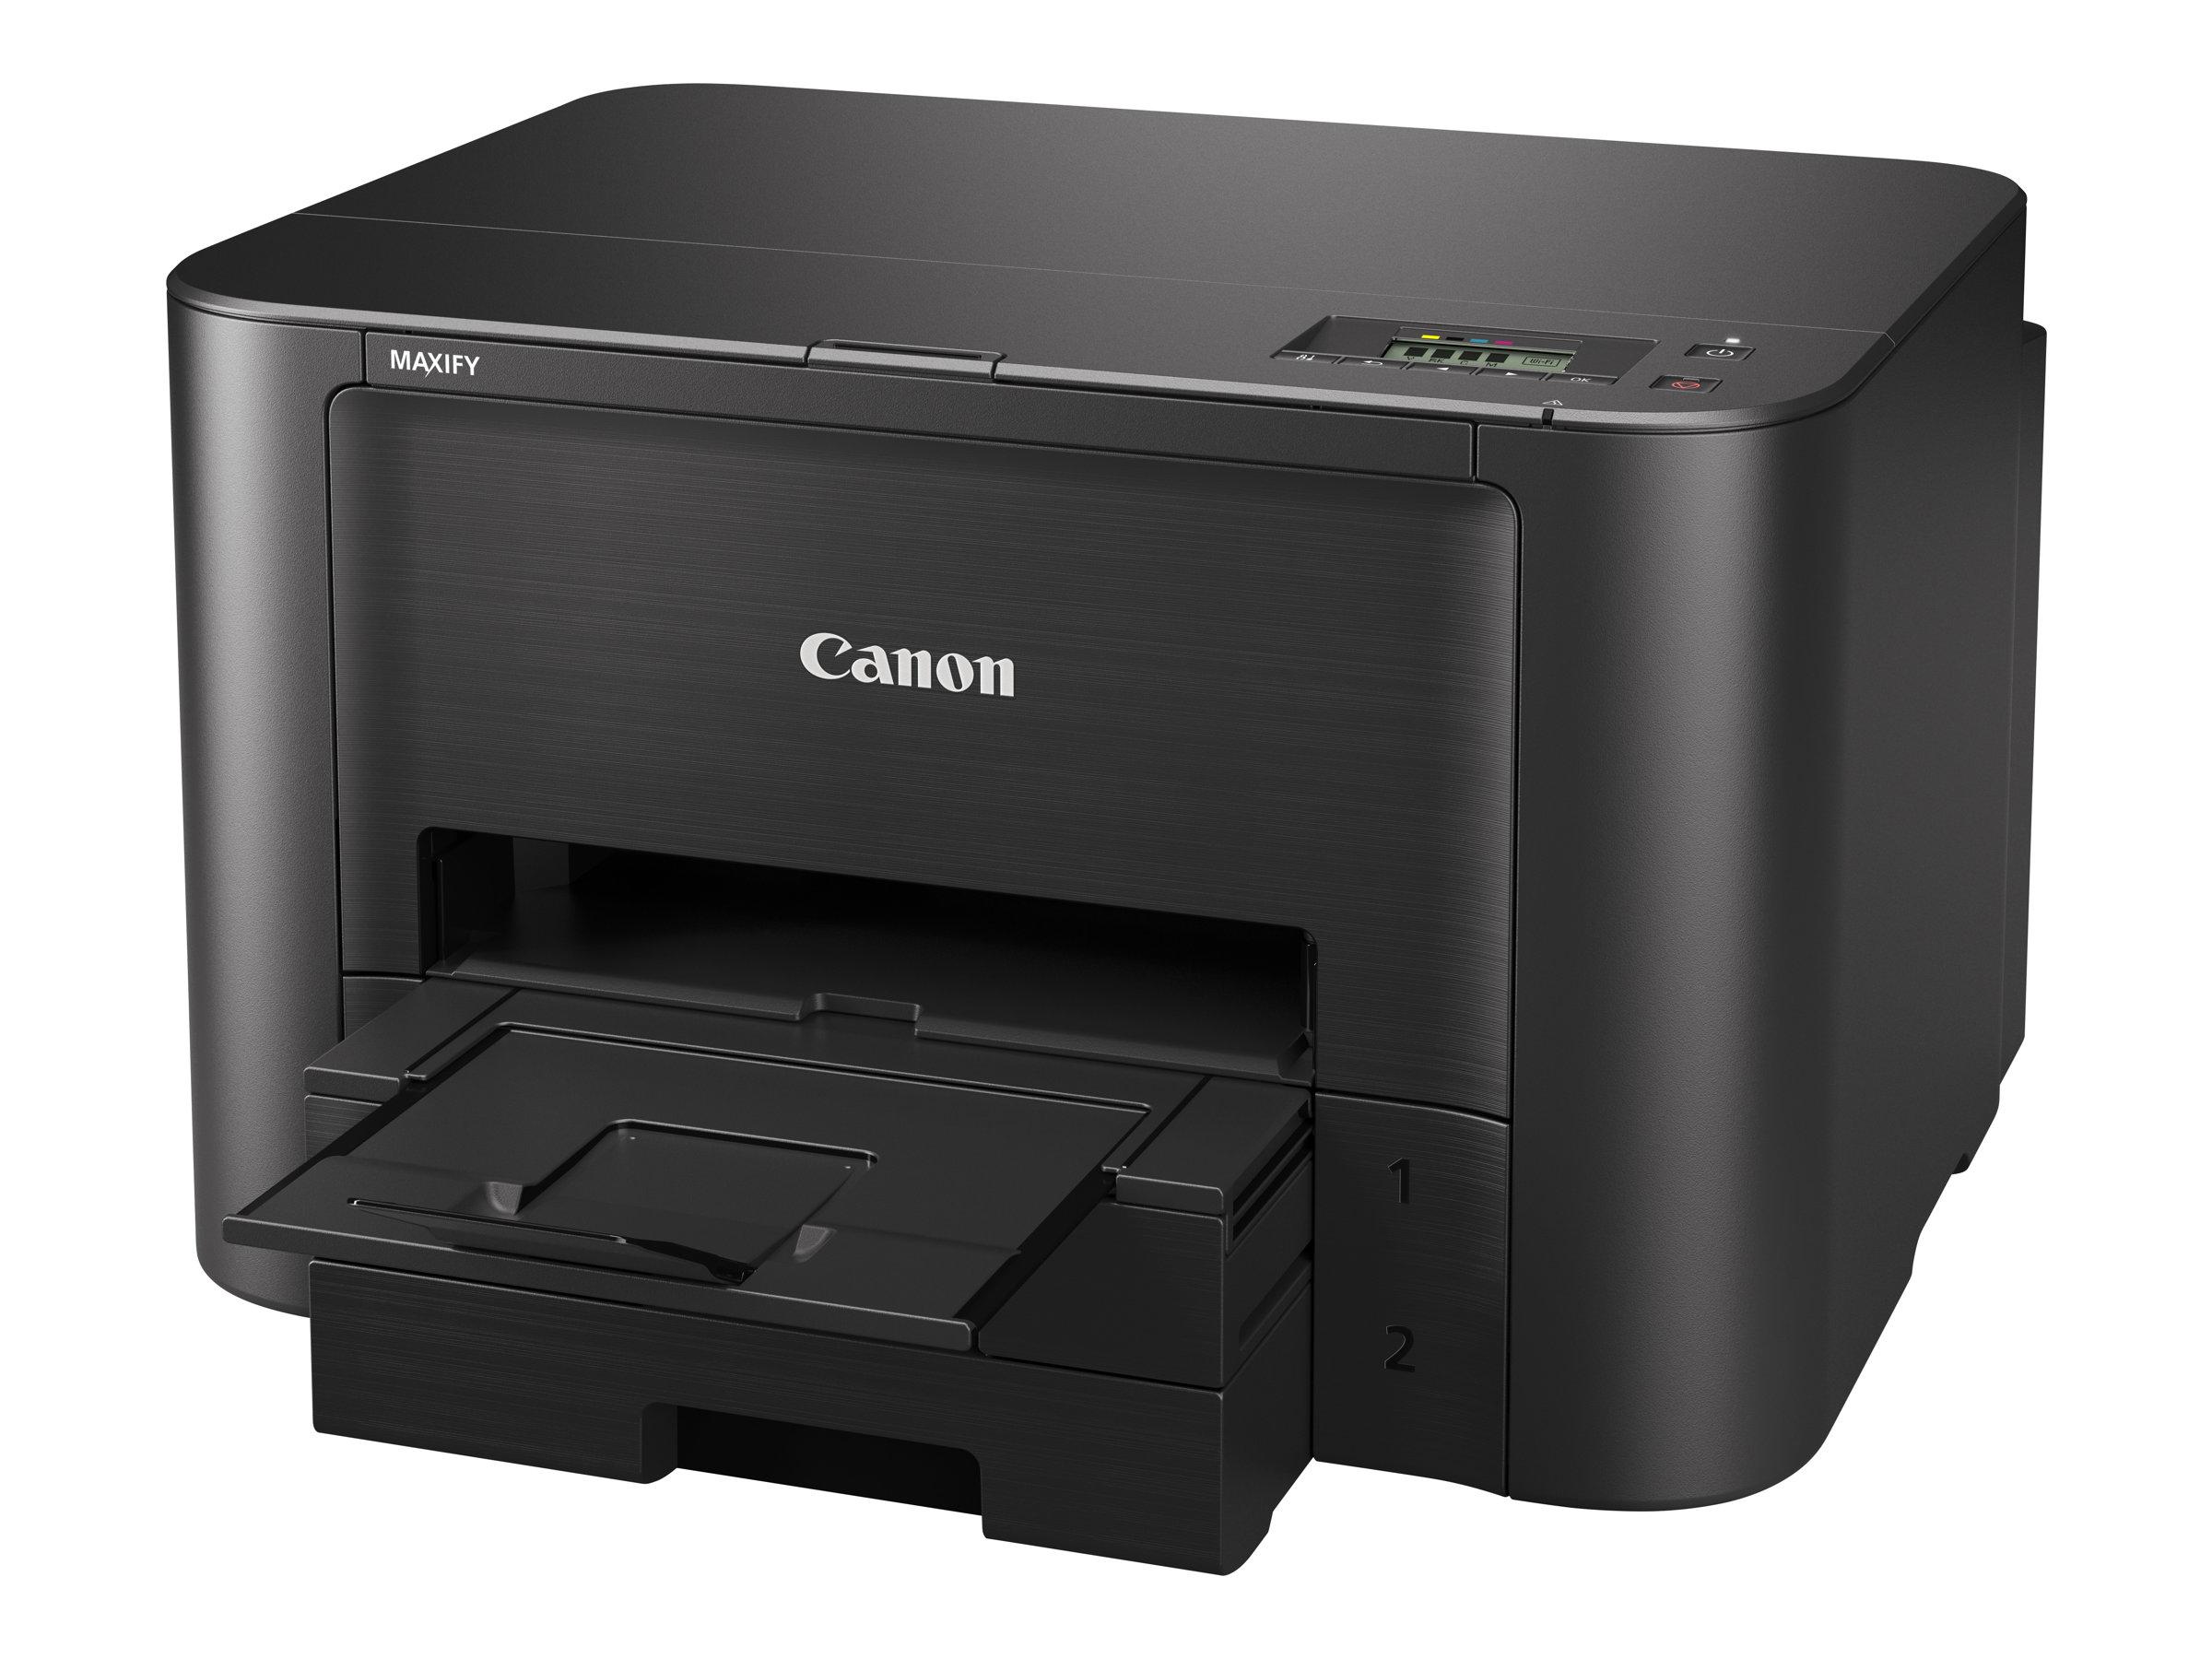 Canon MAXIFY iB4150 - Drucker - Farbe - Duplex - Tintenstrahl - A4/Legal